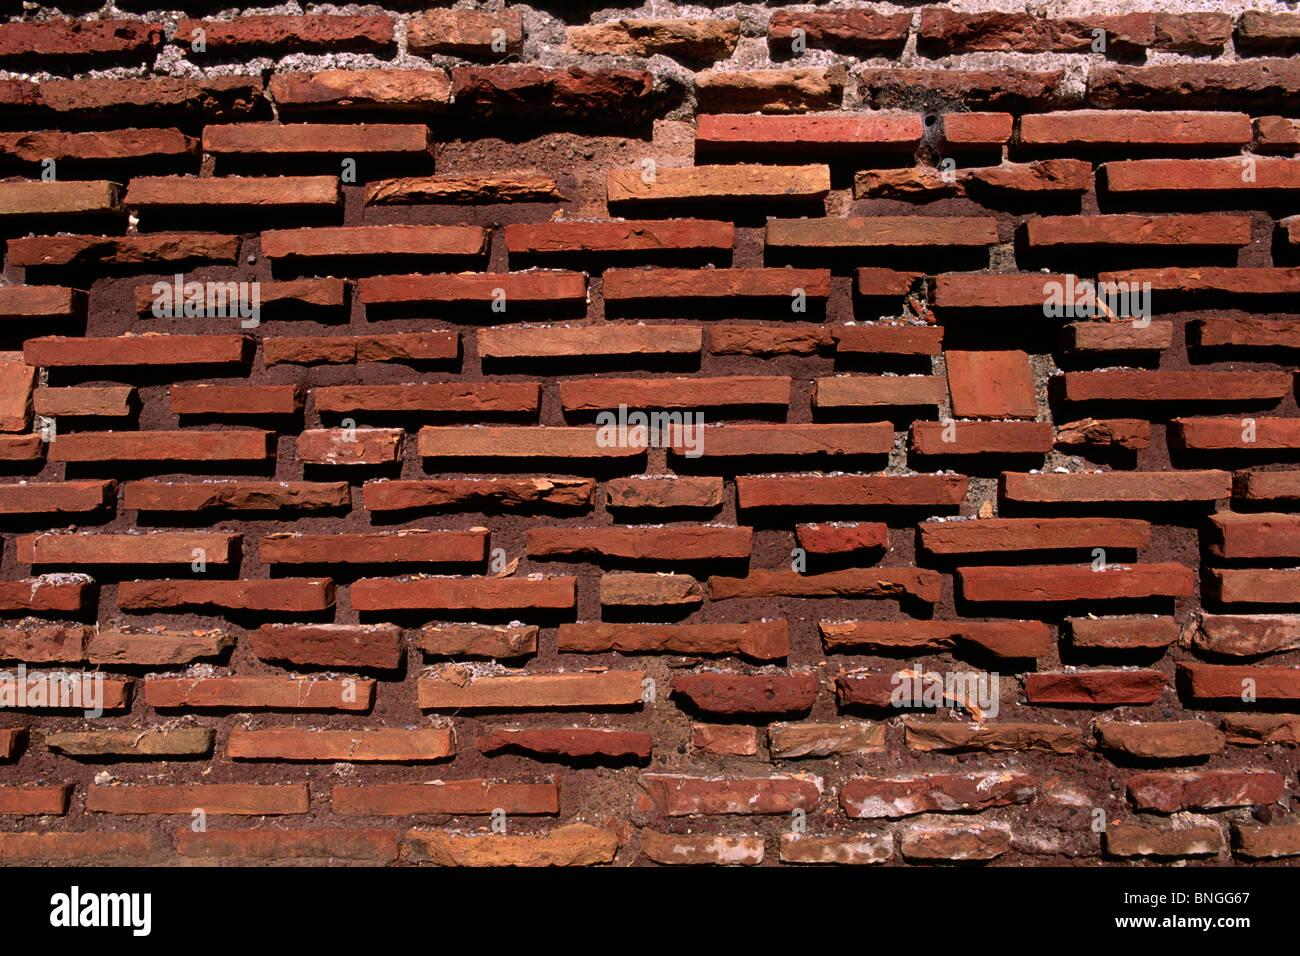 italy, rome, aurelian walls, red bricks close up - Stock Image